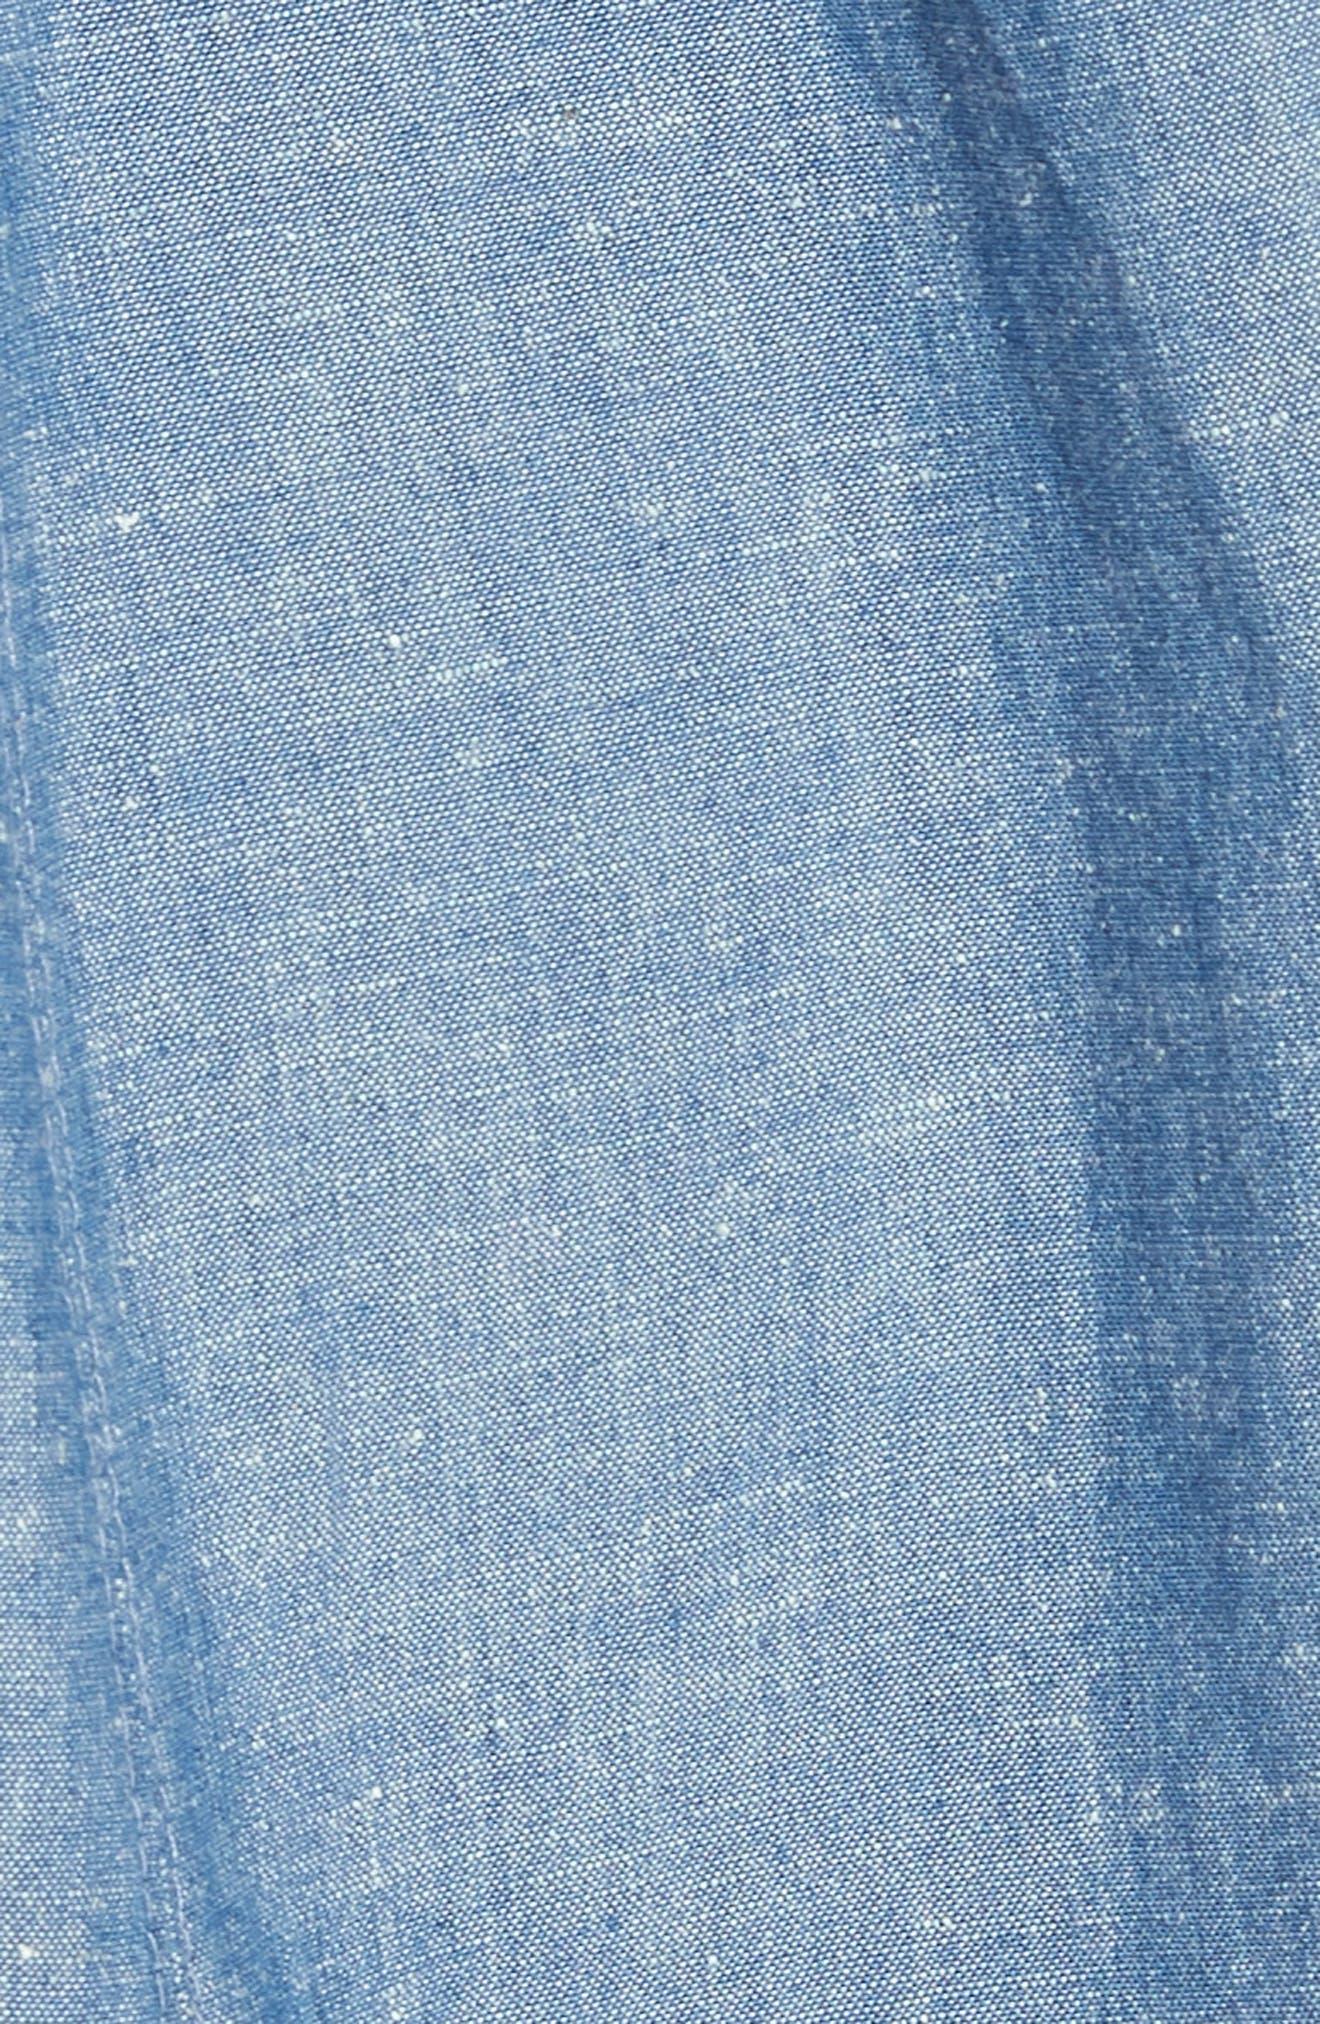 Carolina Chambray Minidress,                             Alternate thumbnail 5, color,                             Blue